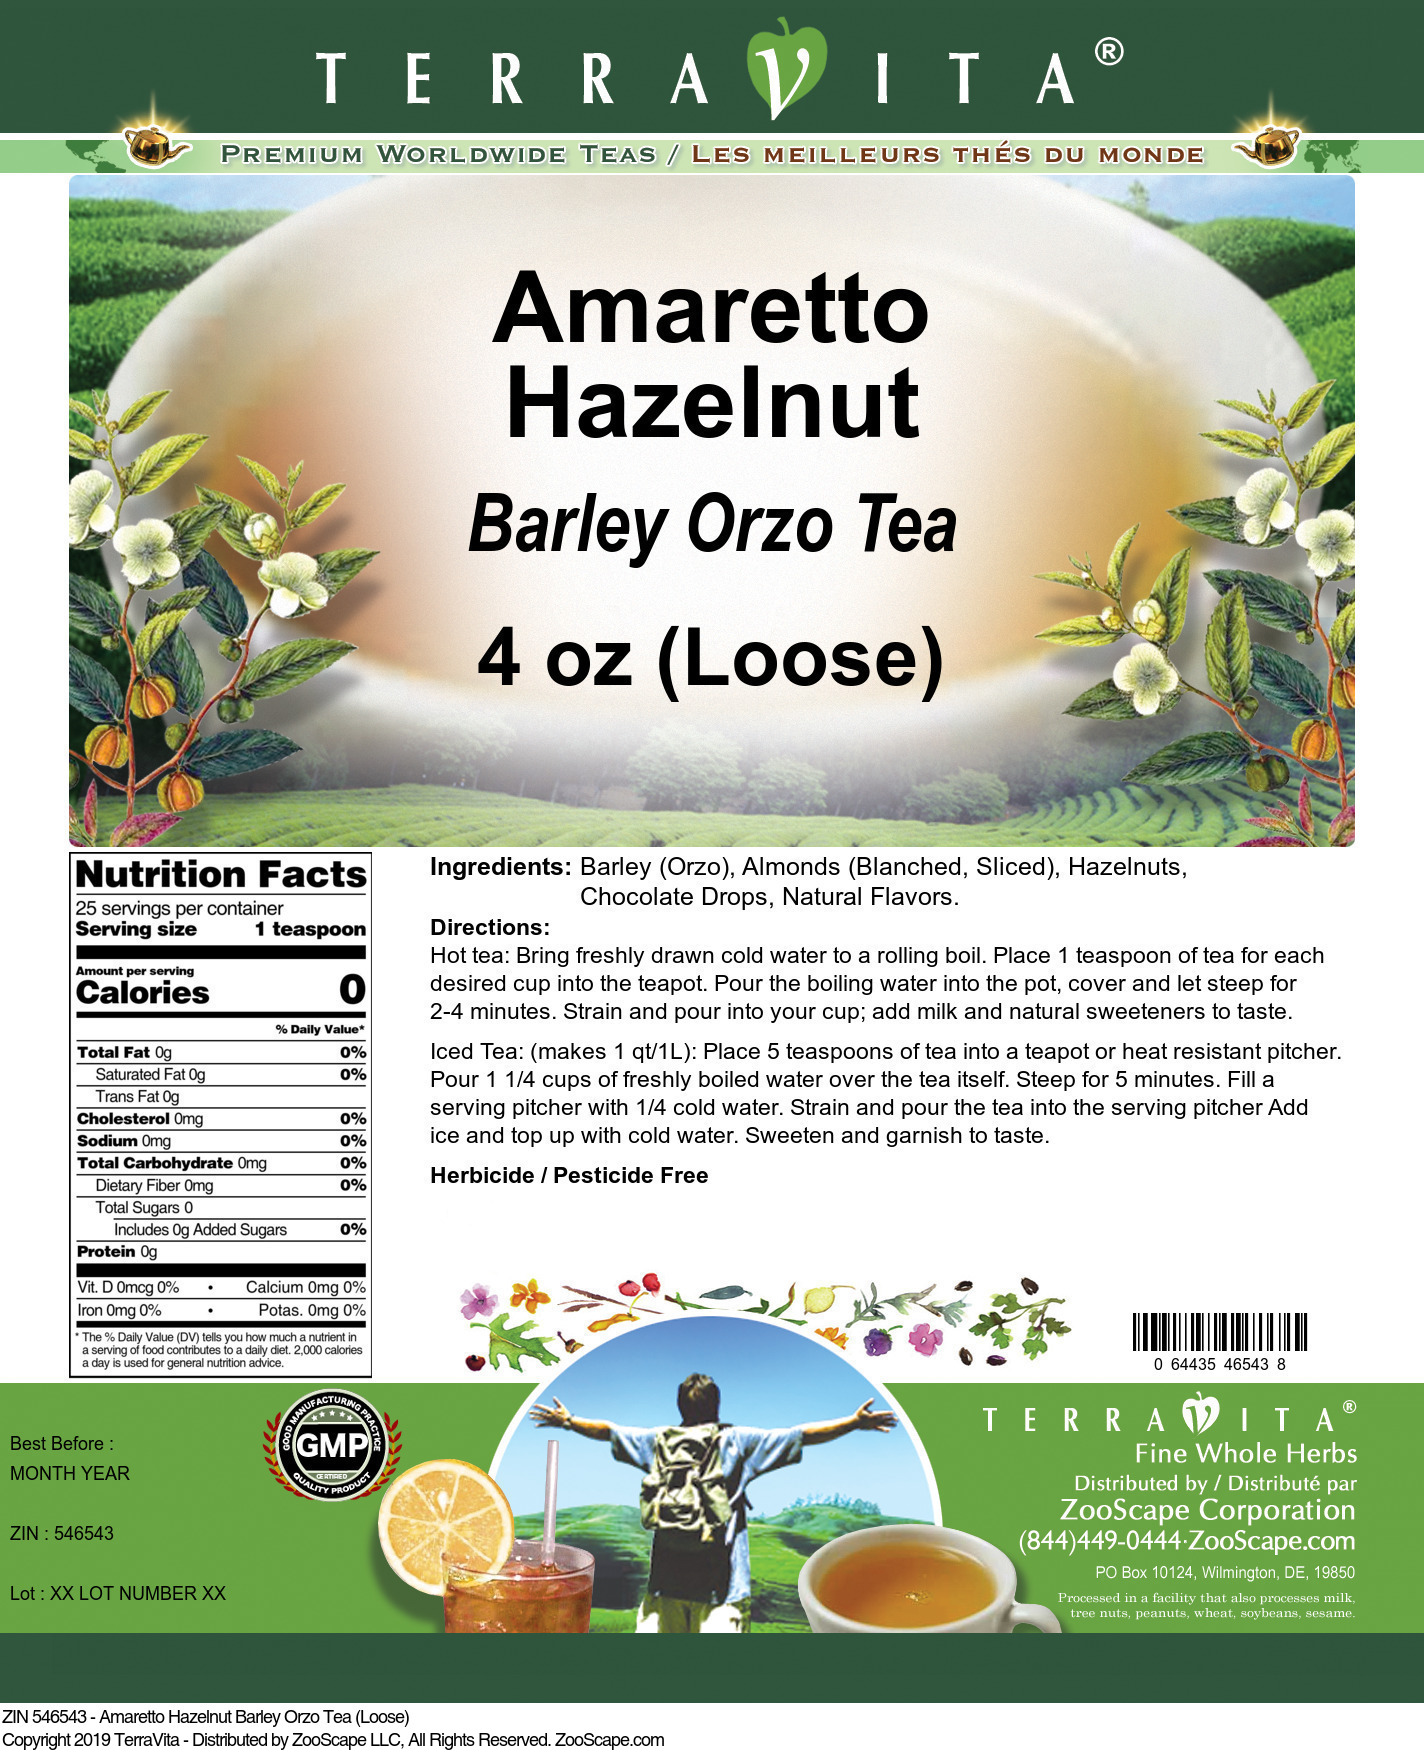 Amaretto Hazelnut Barley Orzo